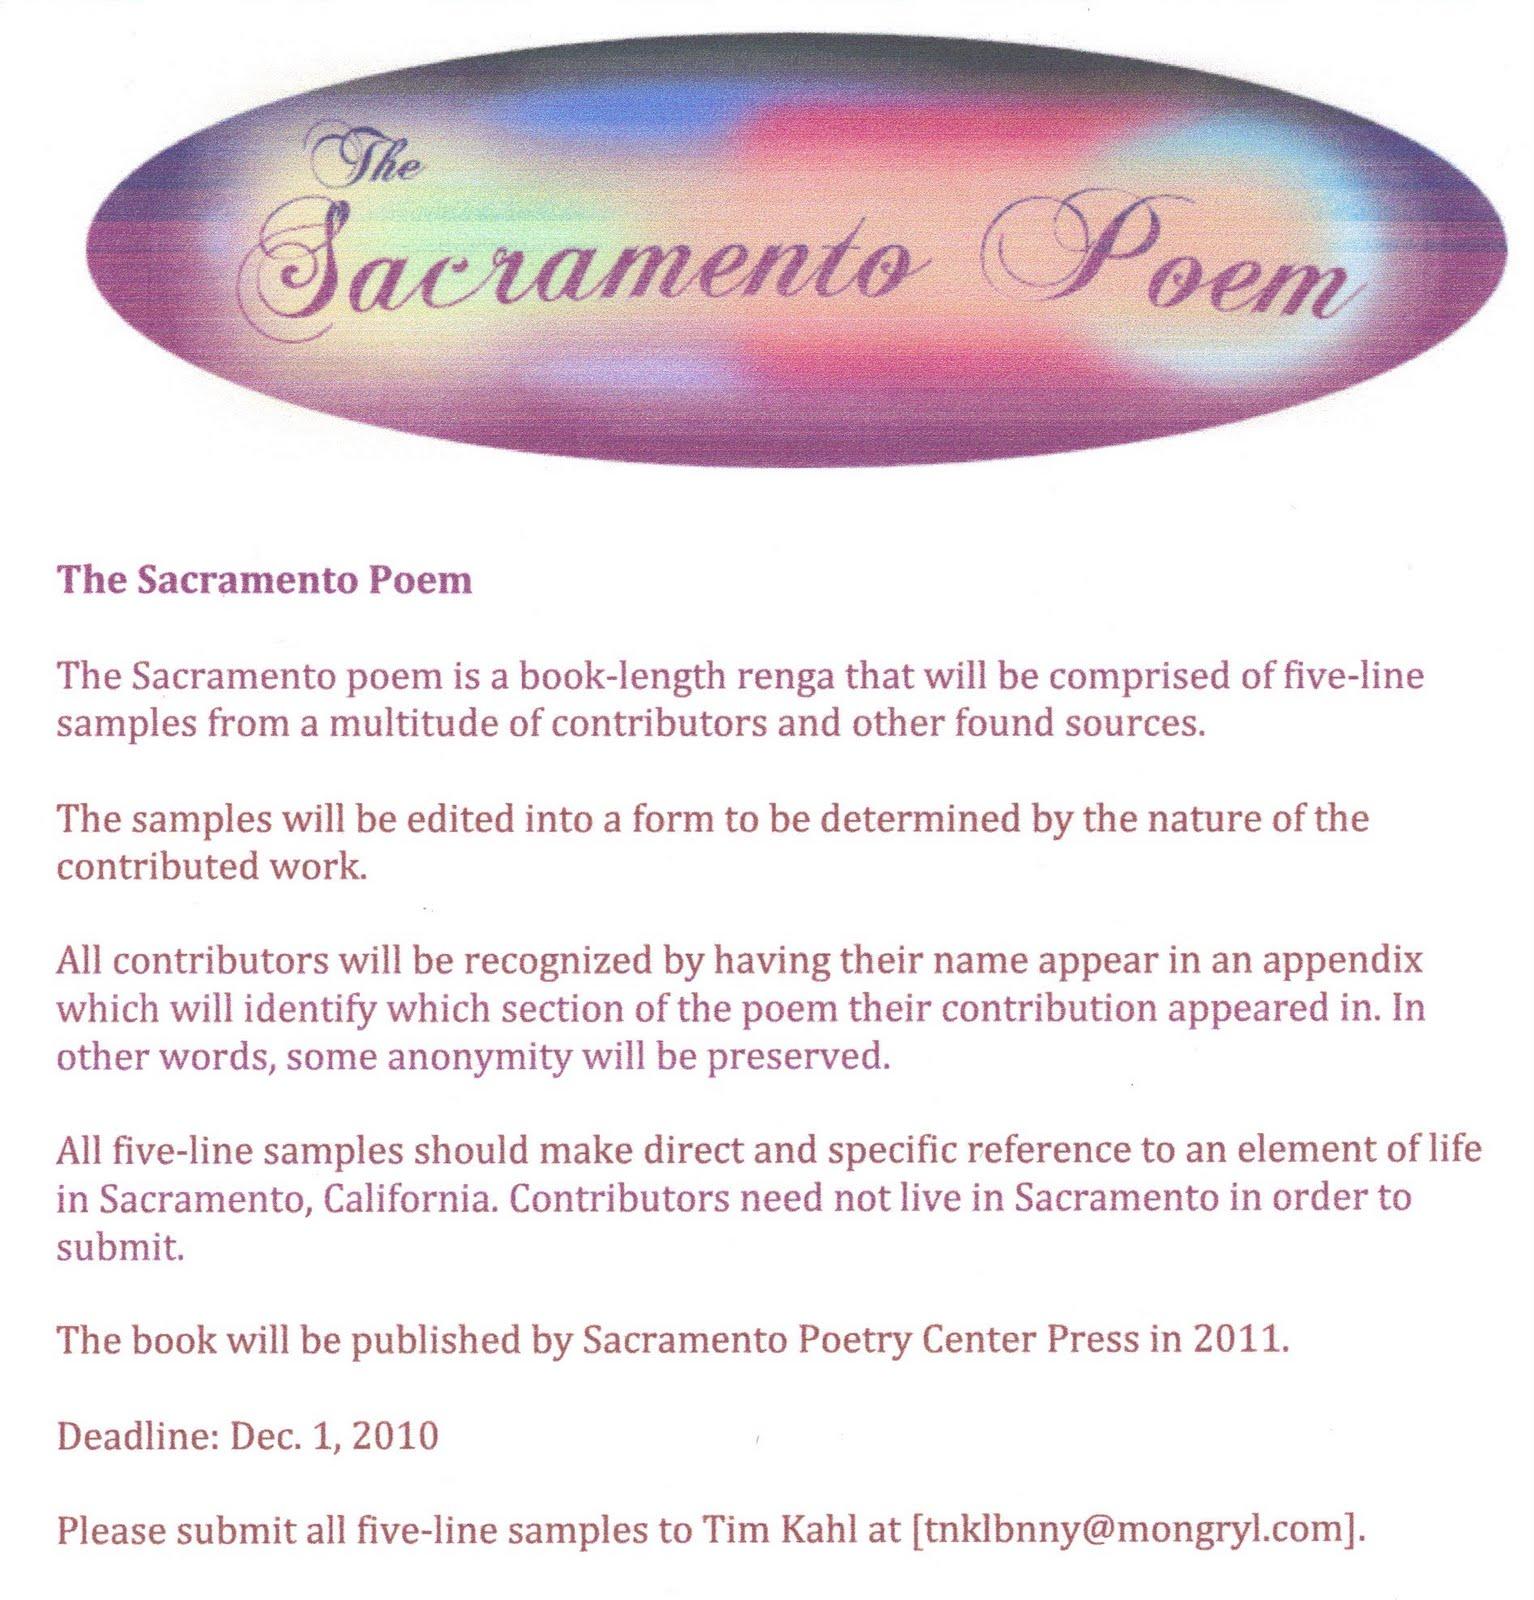 Sister Poems That Make You Cry The sacramento poem - deadlineLittle Sister Poems That Make You Cry